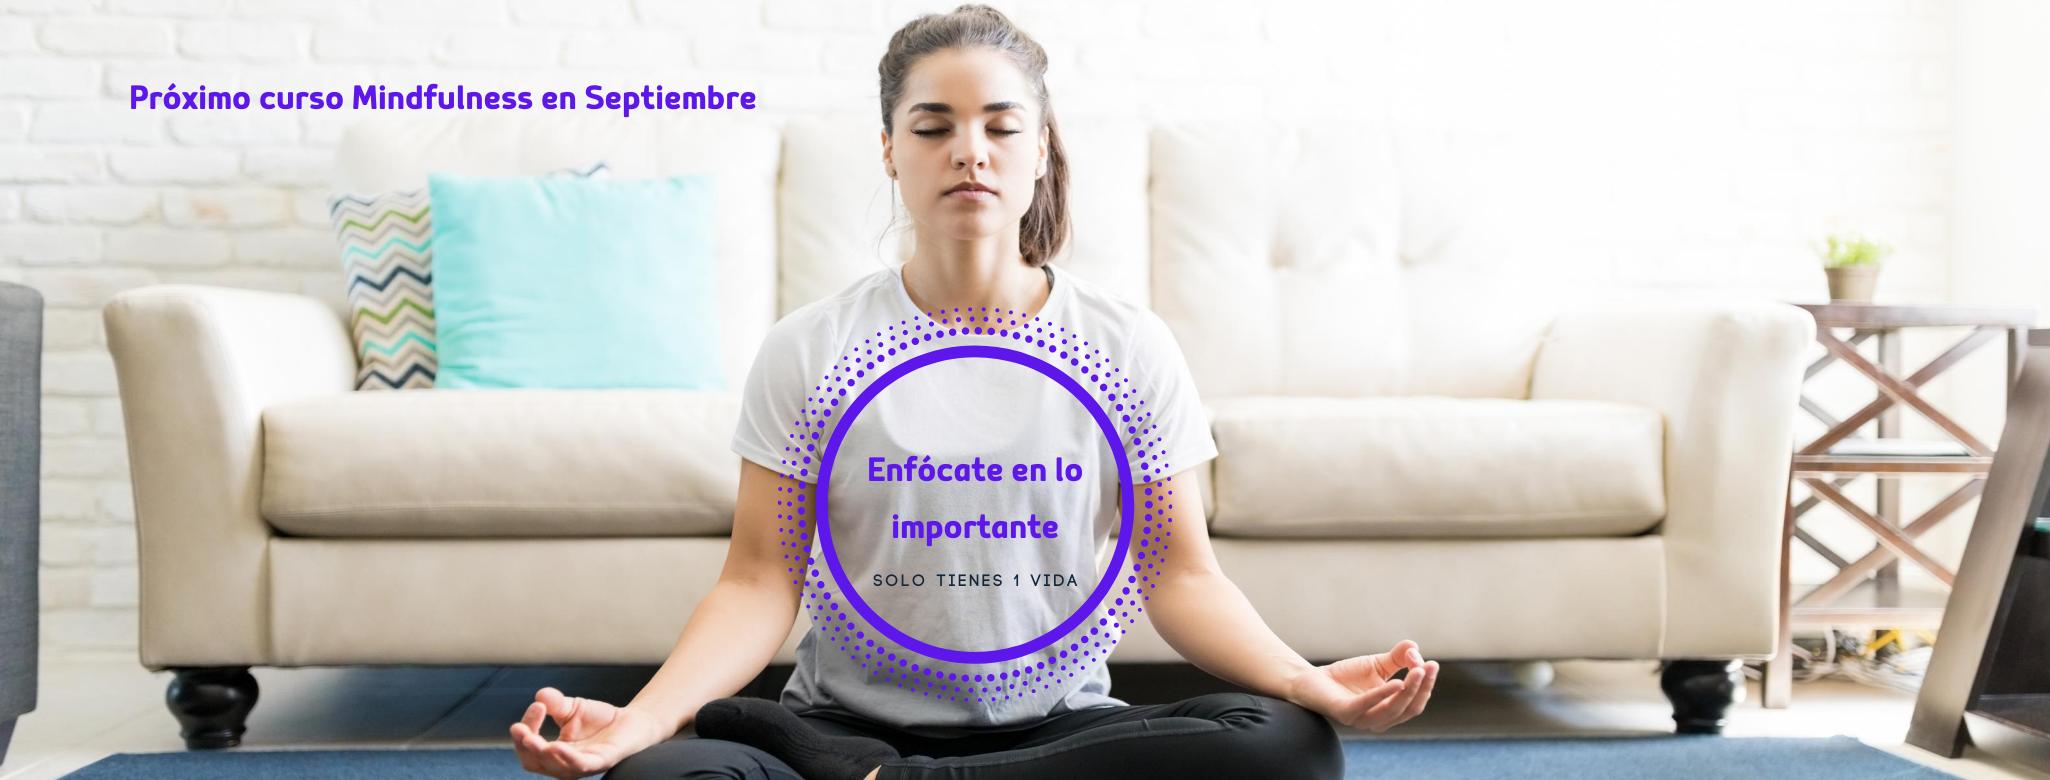 Curso Mindfulness para reducción de estrés -Septiembre 2020